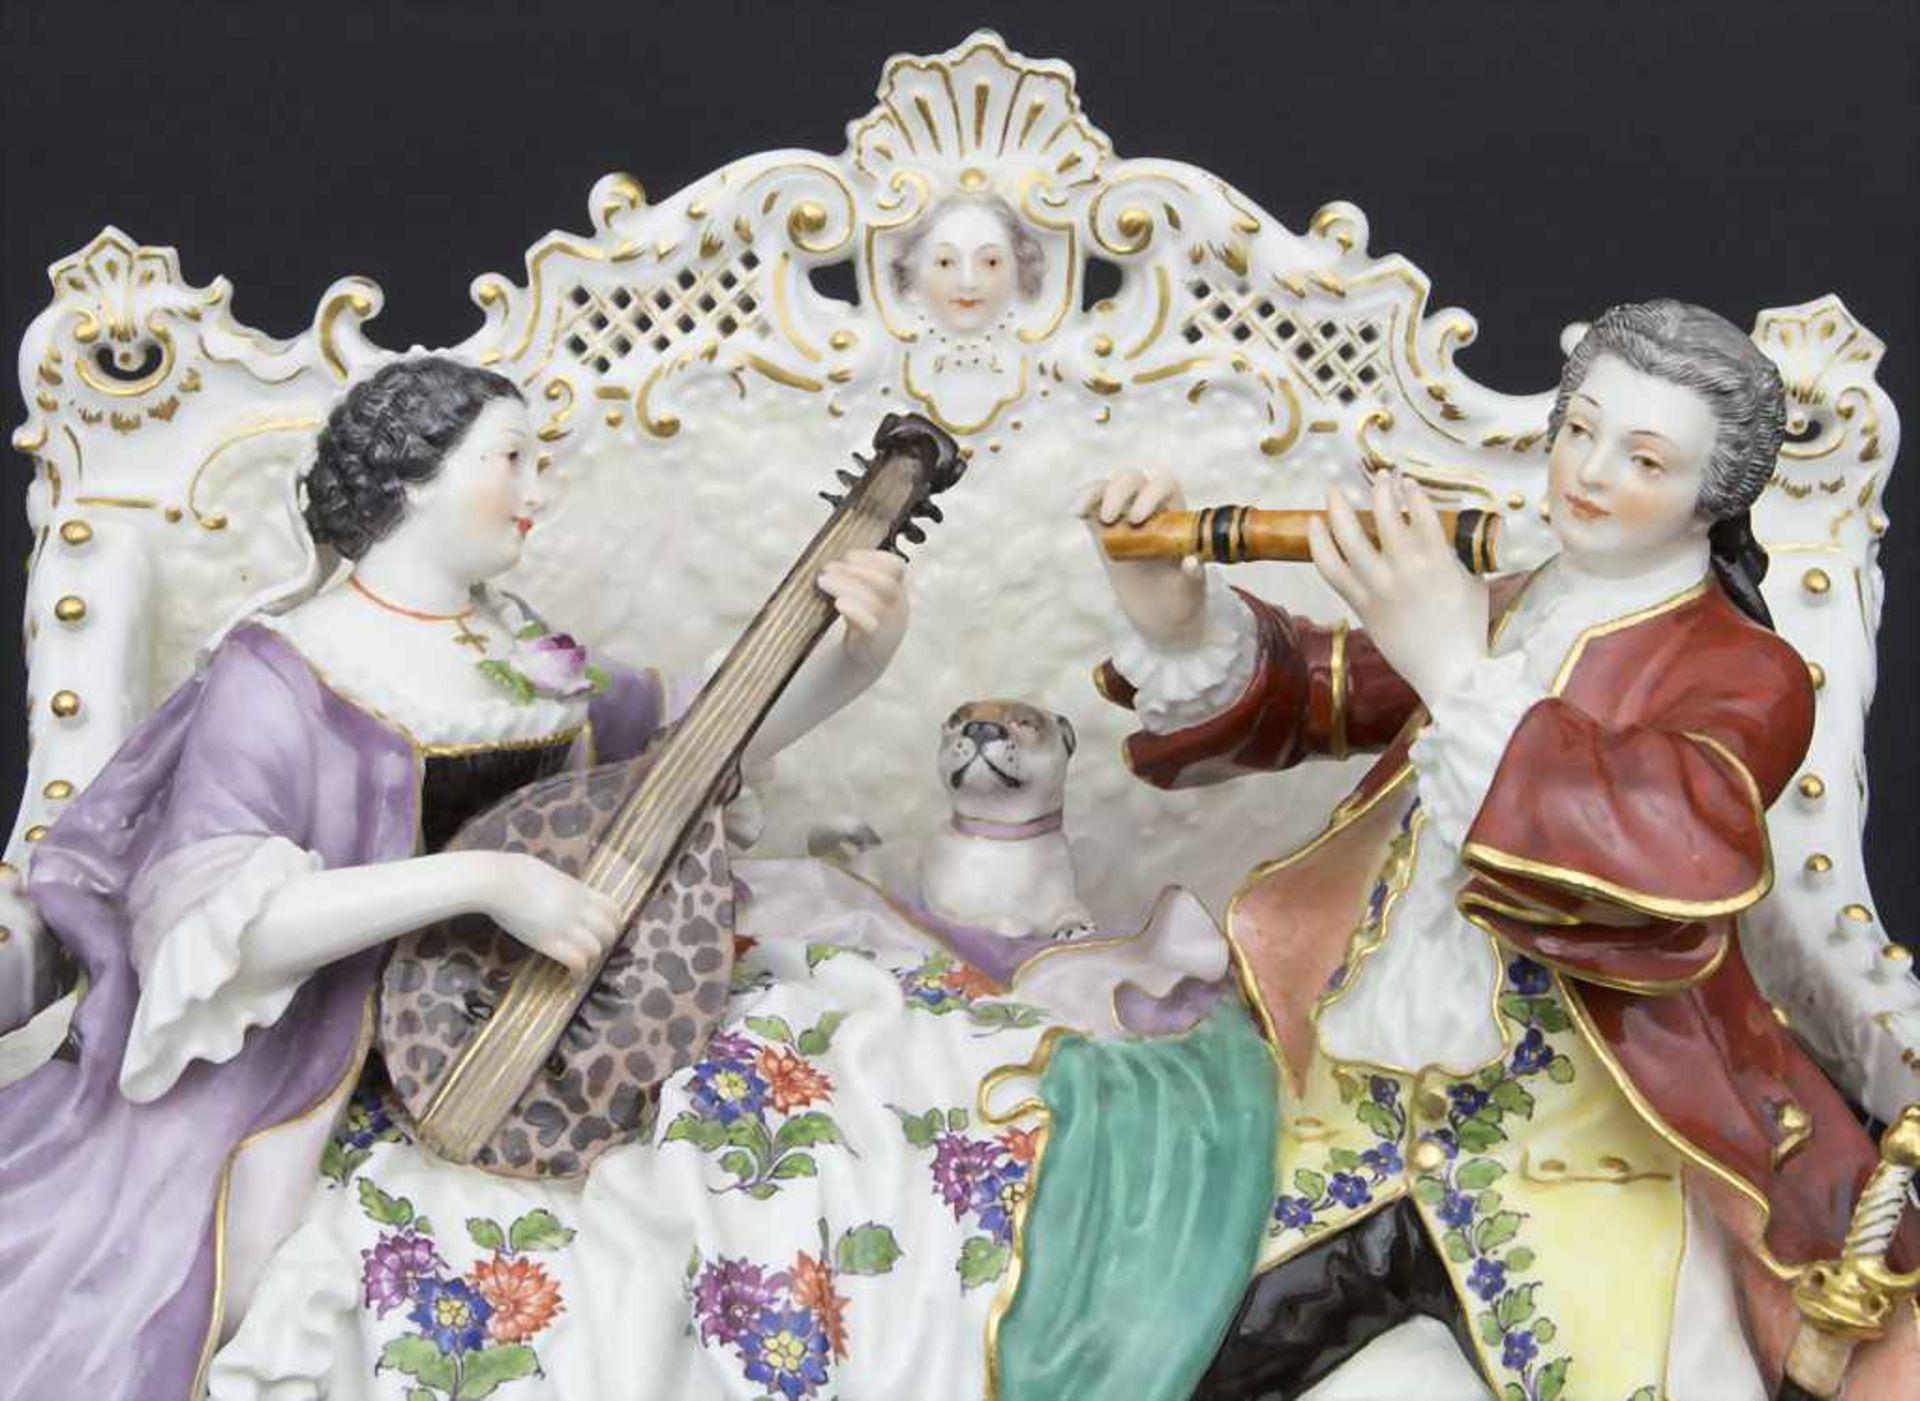 'Sofagruppe', musizierendes Paar mit Mops / A couple of musicians with a pug dog, Meissen, Mitte 19. - Bild 2 aus 9